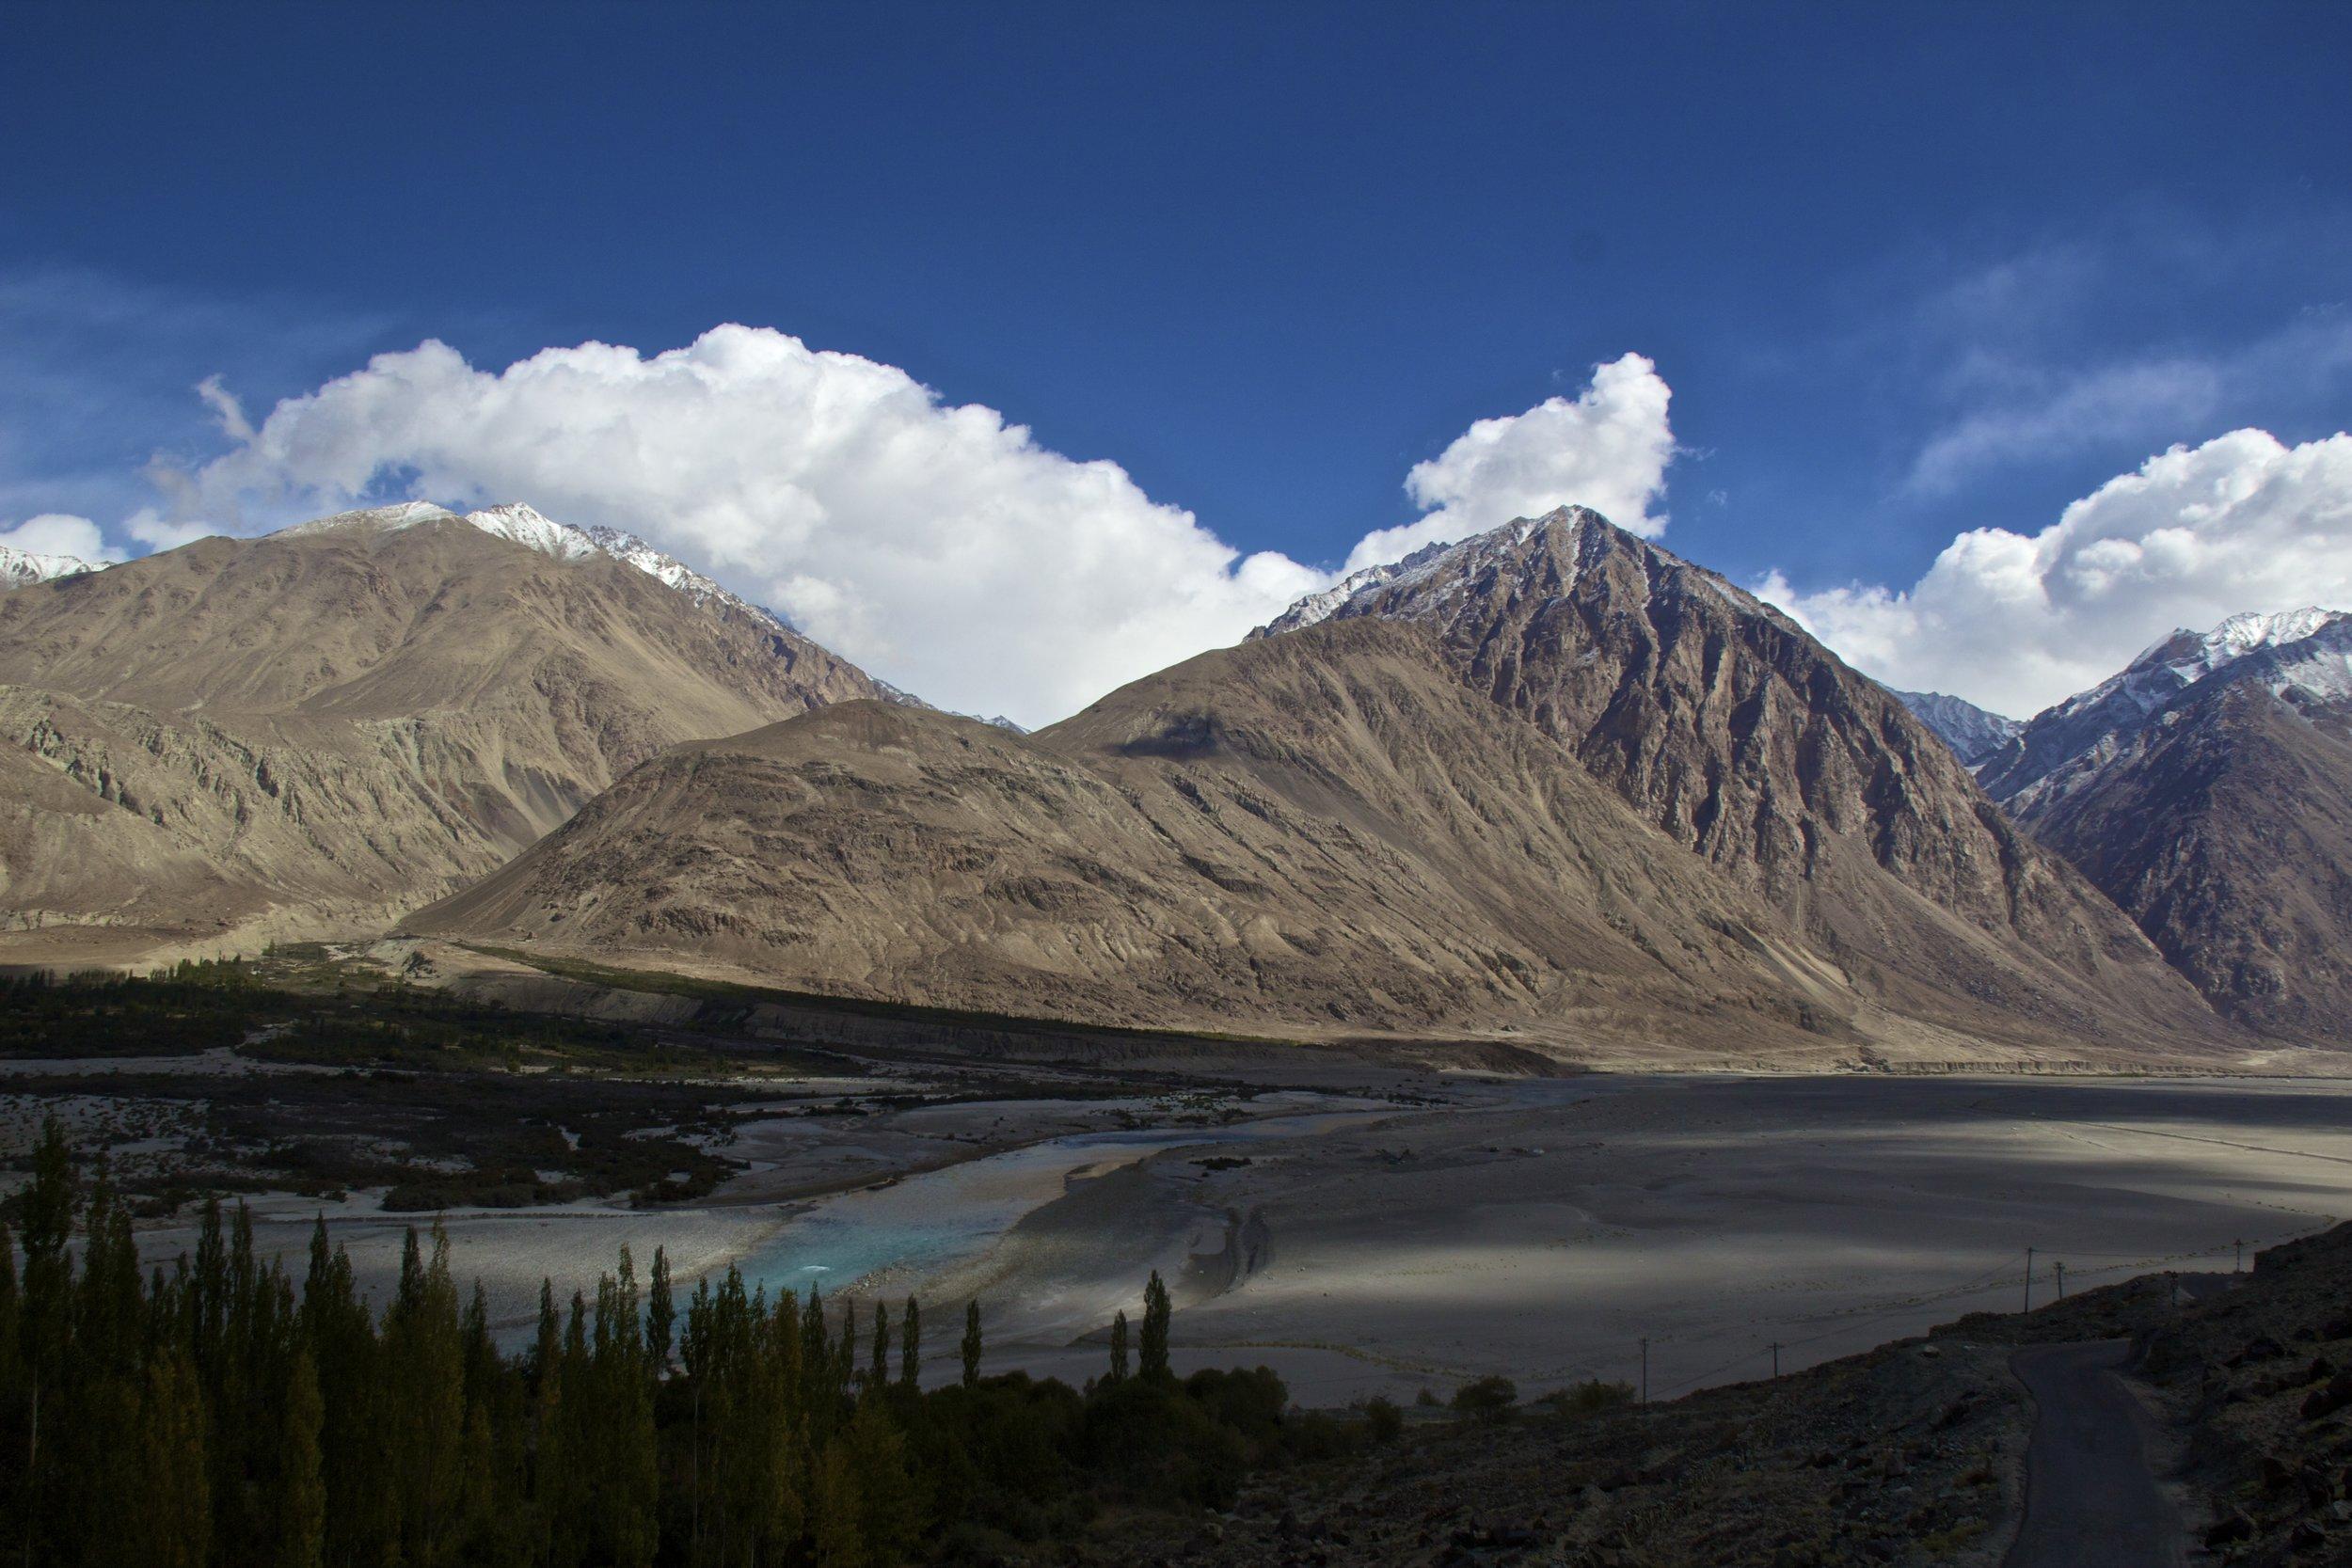 Shyok River Ladakh Gilgit Baltistan Indian Himalayas Nubra Valley 1.jpg